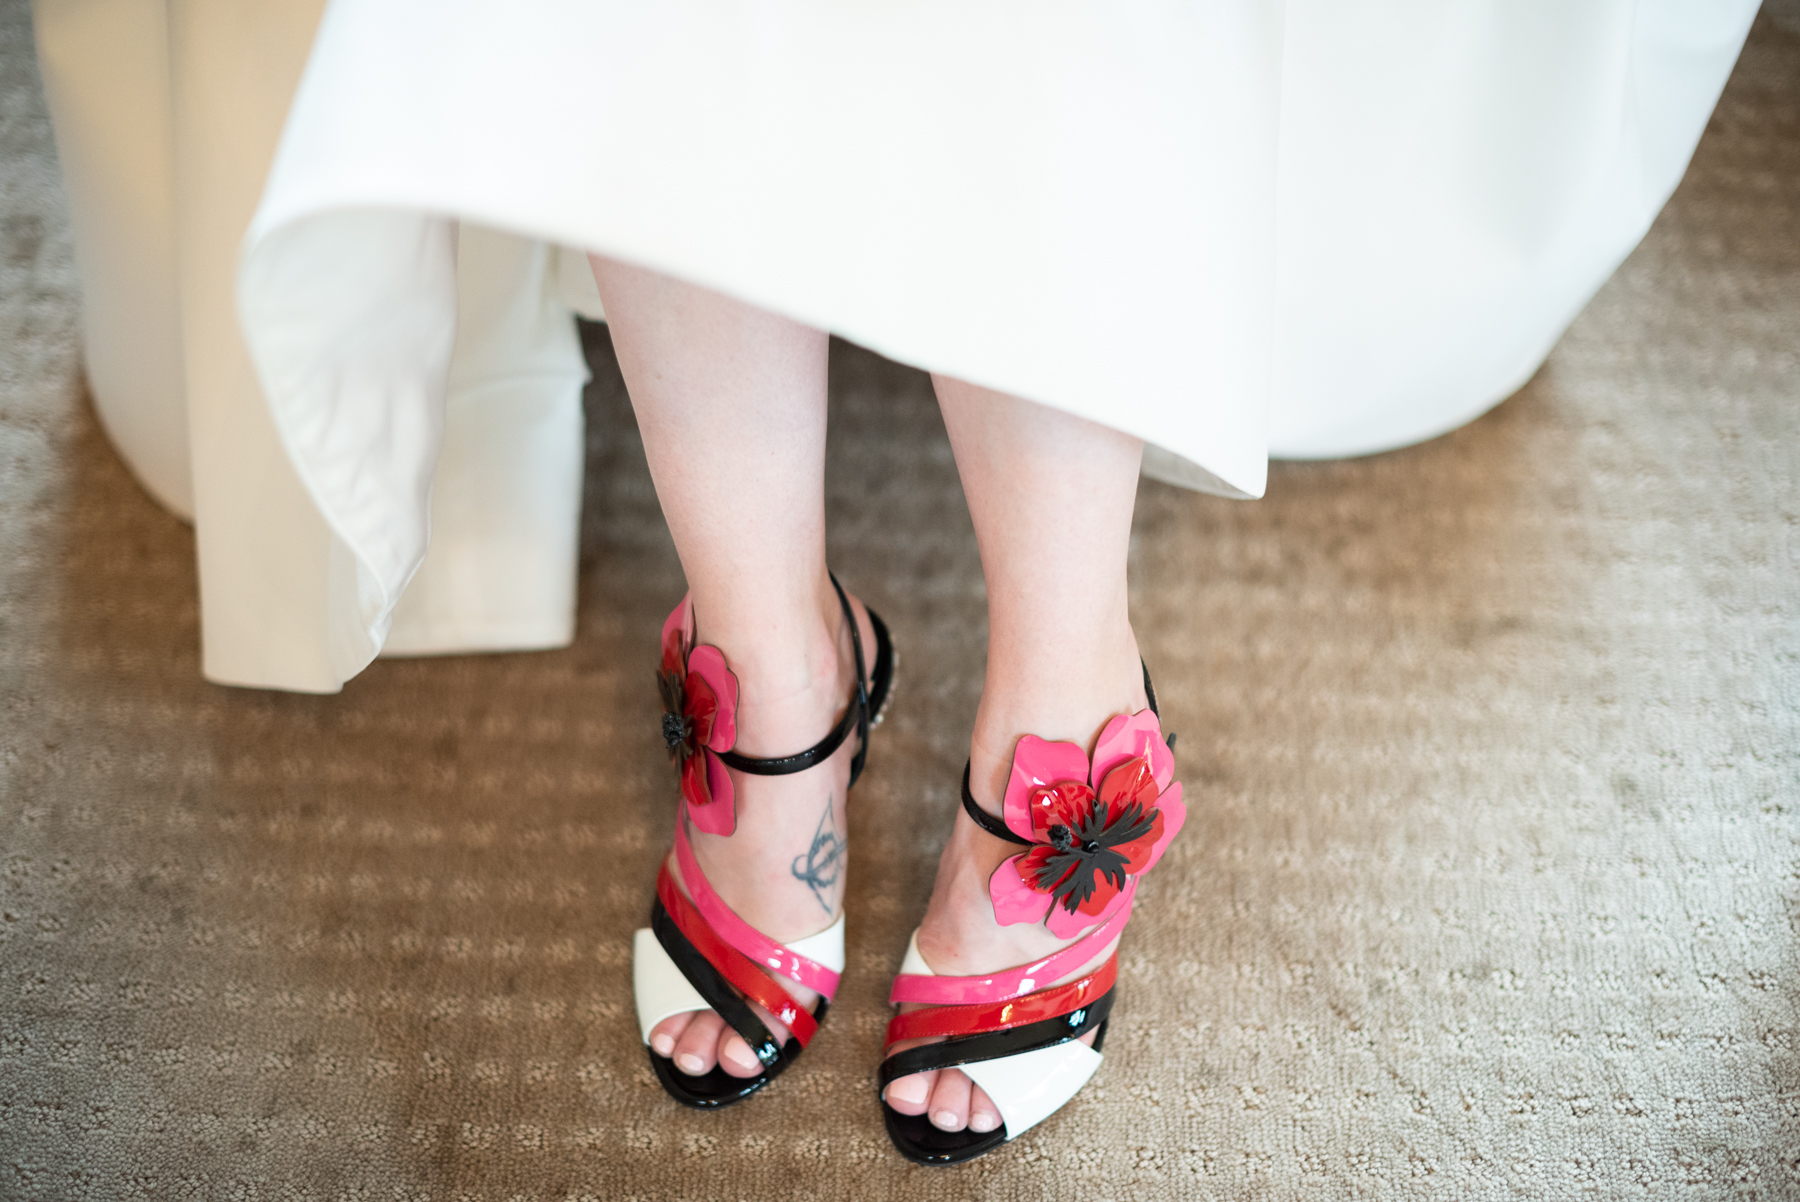 Secret Garden Event Center Wedding - Meredith Amadee Photography-6-3.jpg